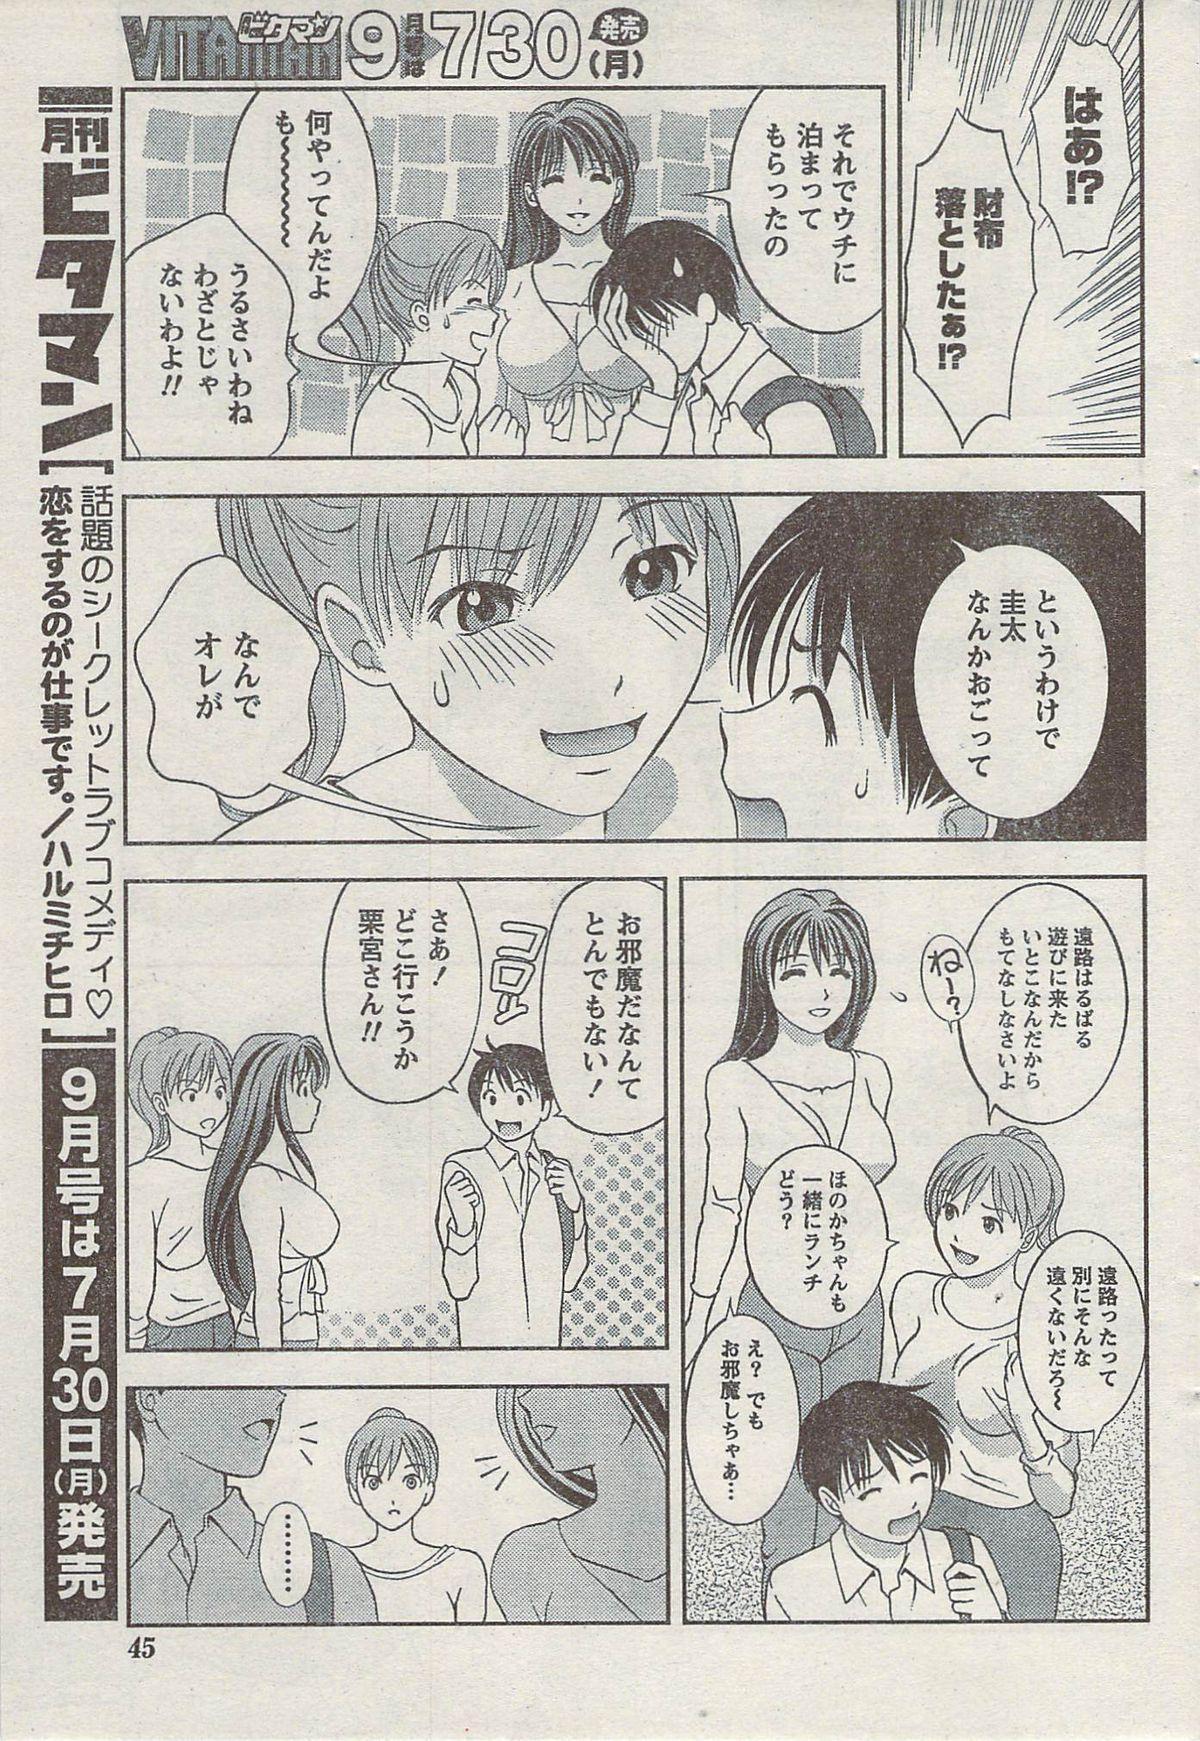 Monthly Vitaman 2007-08 44